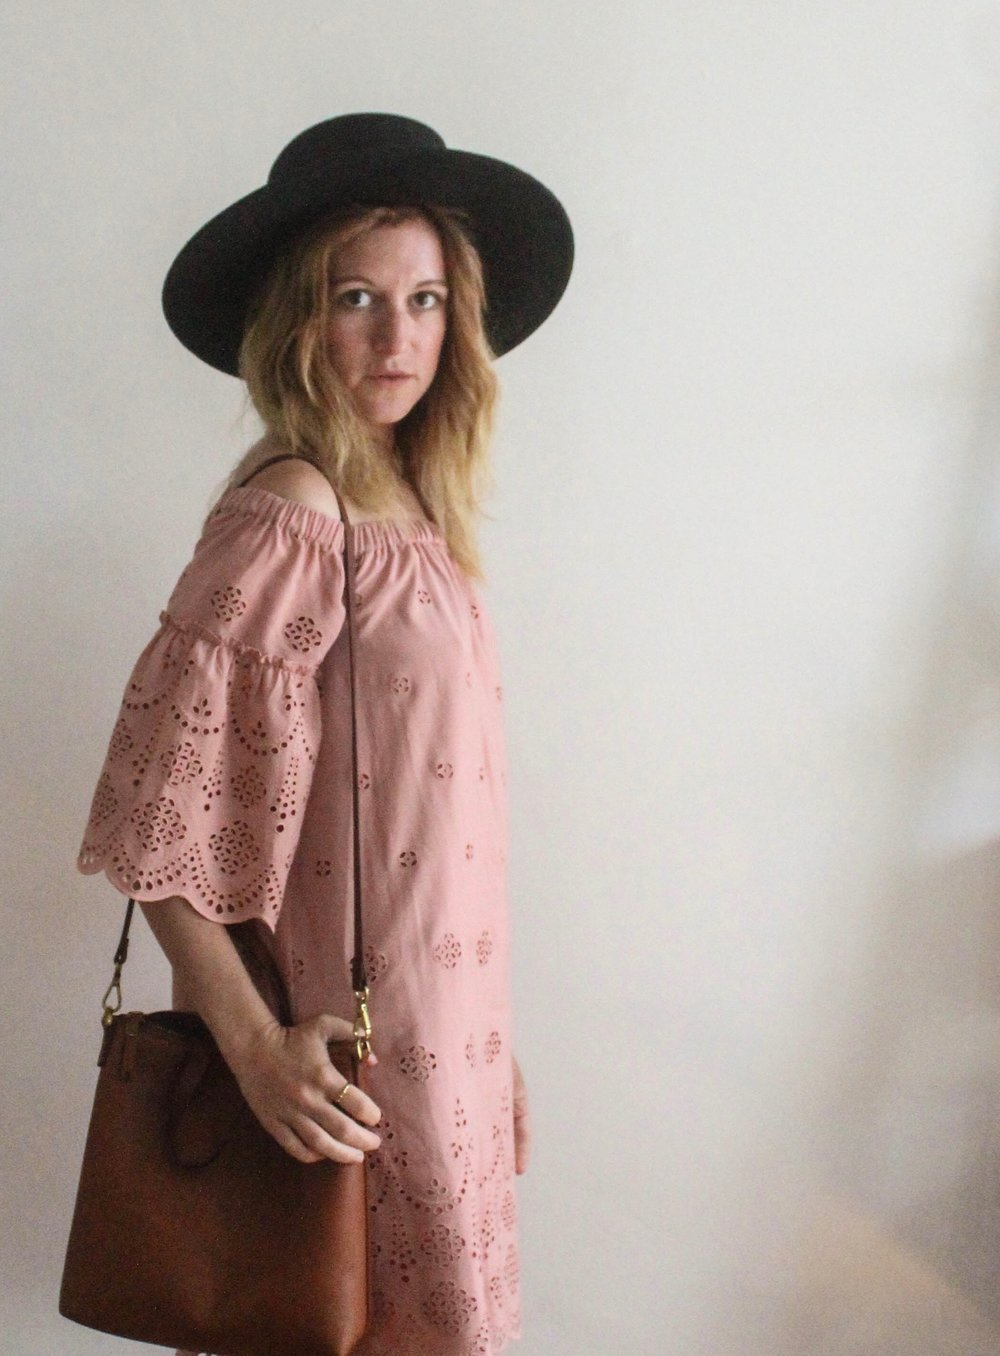 Pink-Dress-Life-By-Bri-4.jpg